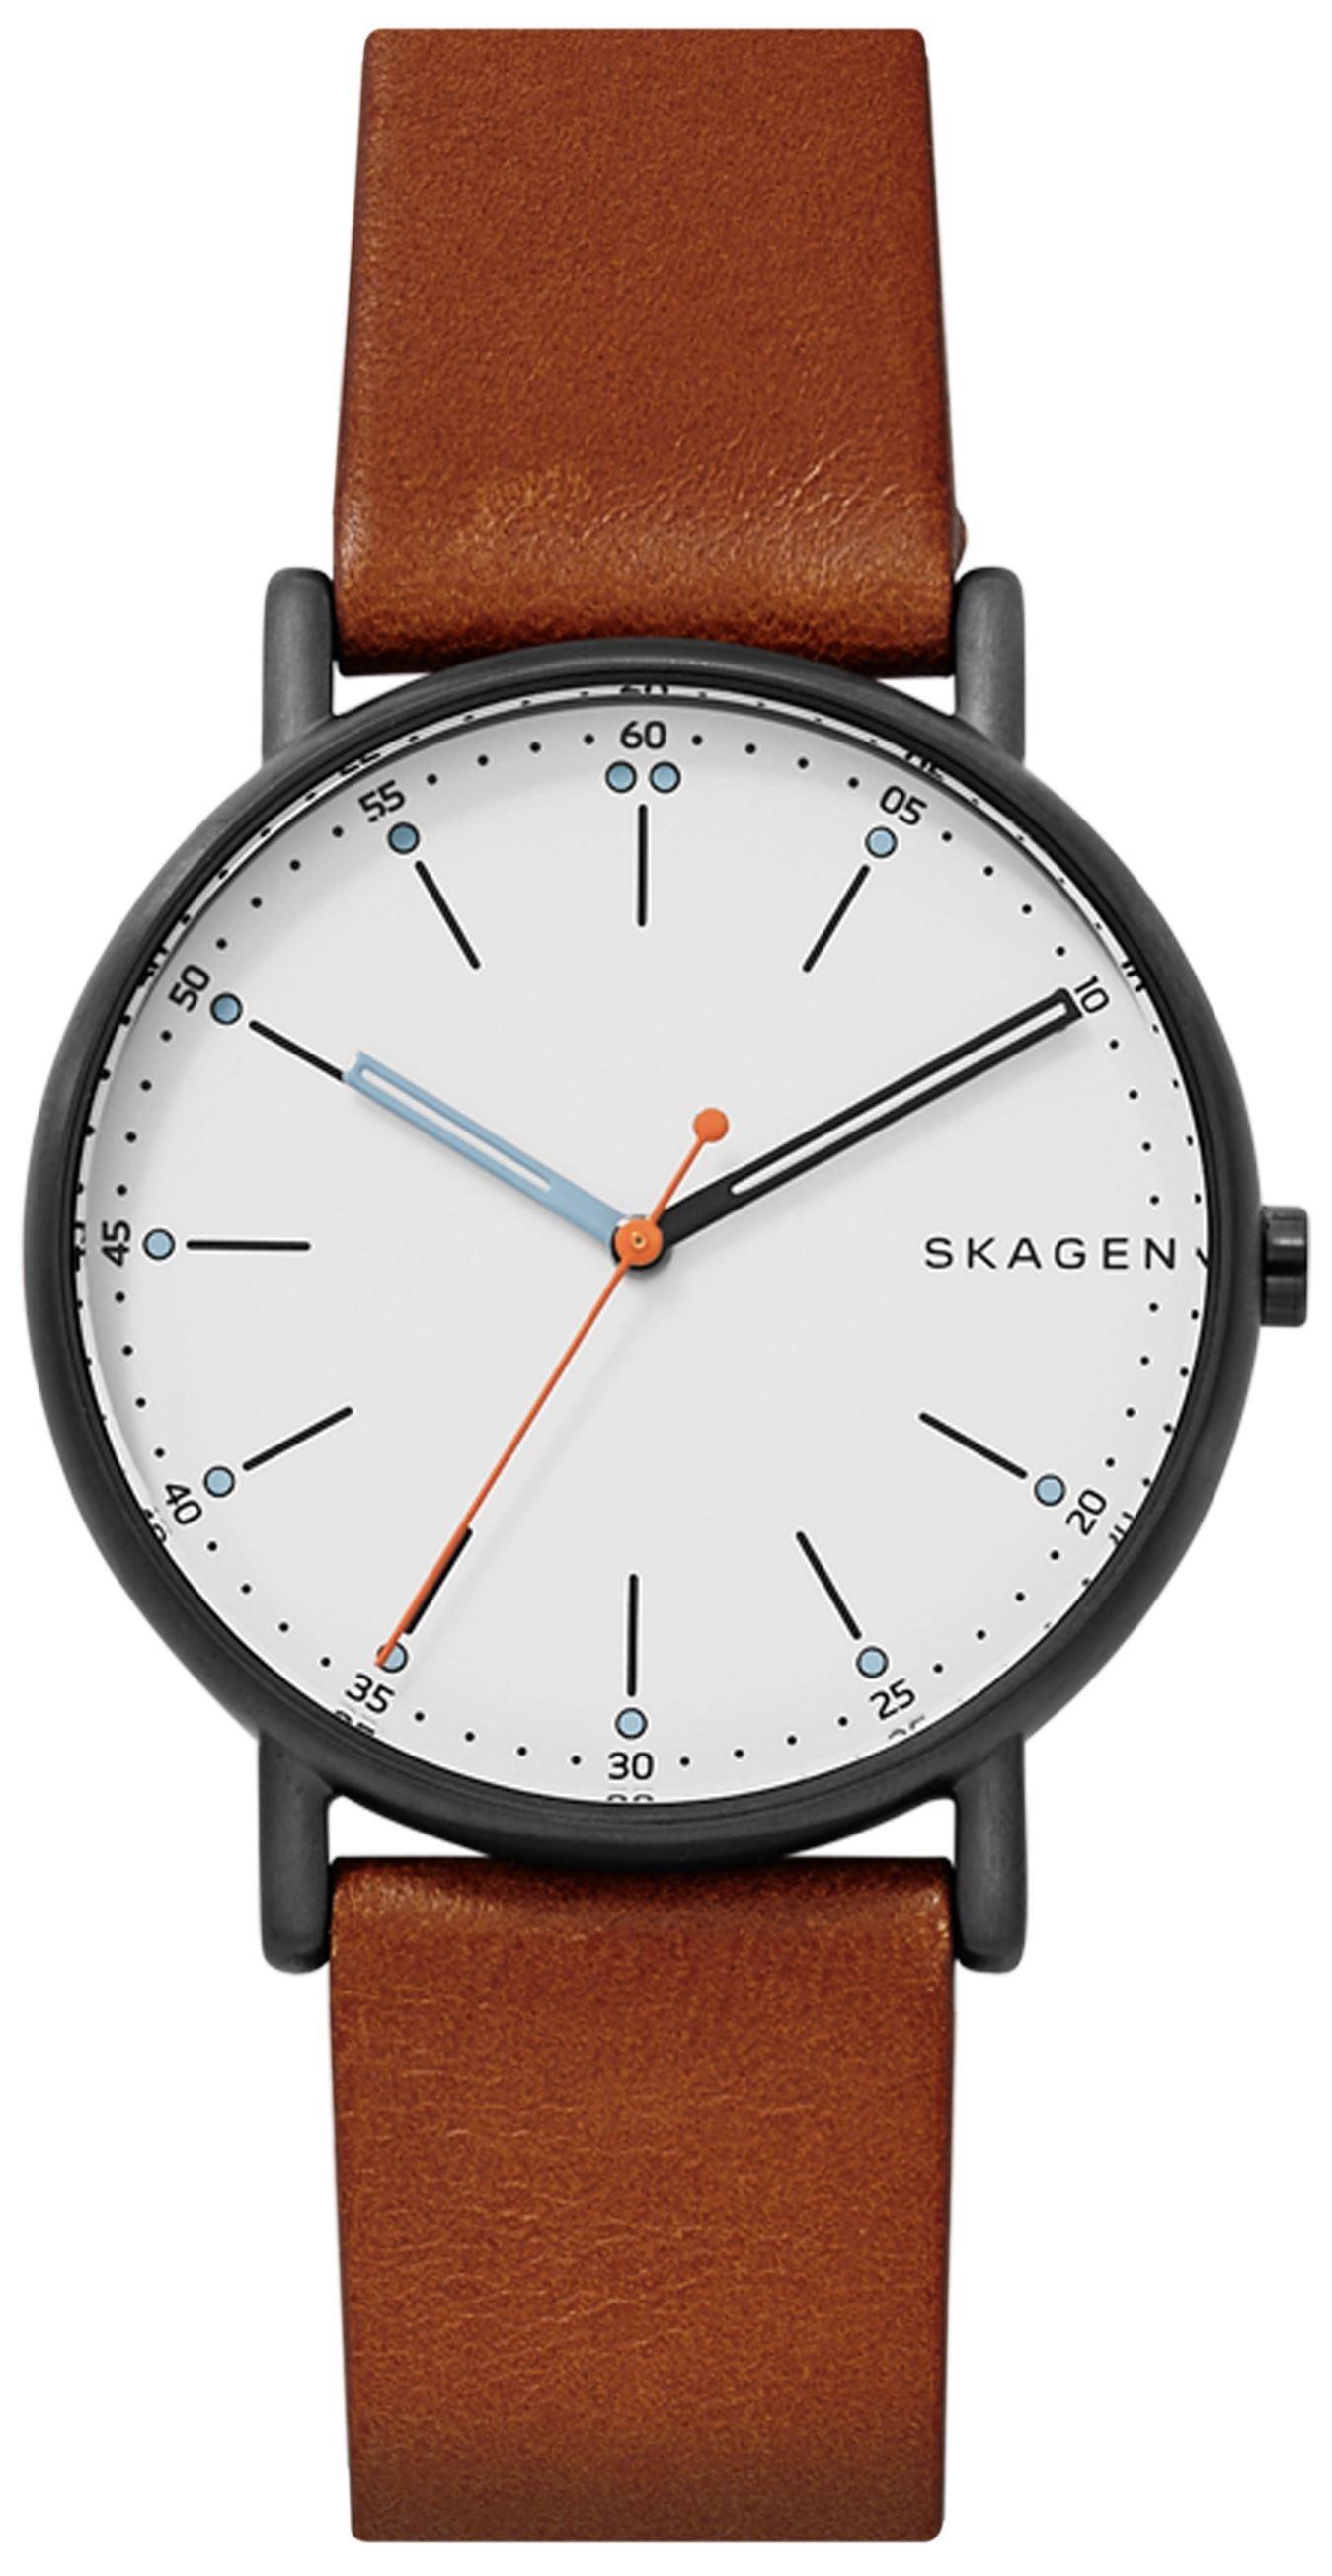 Skagen 99999 Herreklokke SKW6374 Hvit/Lær Ø40 mm - Skagen